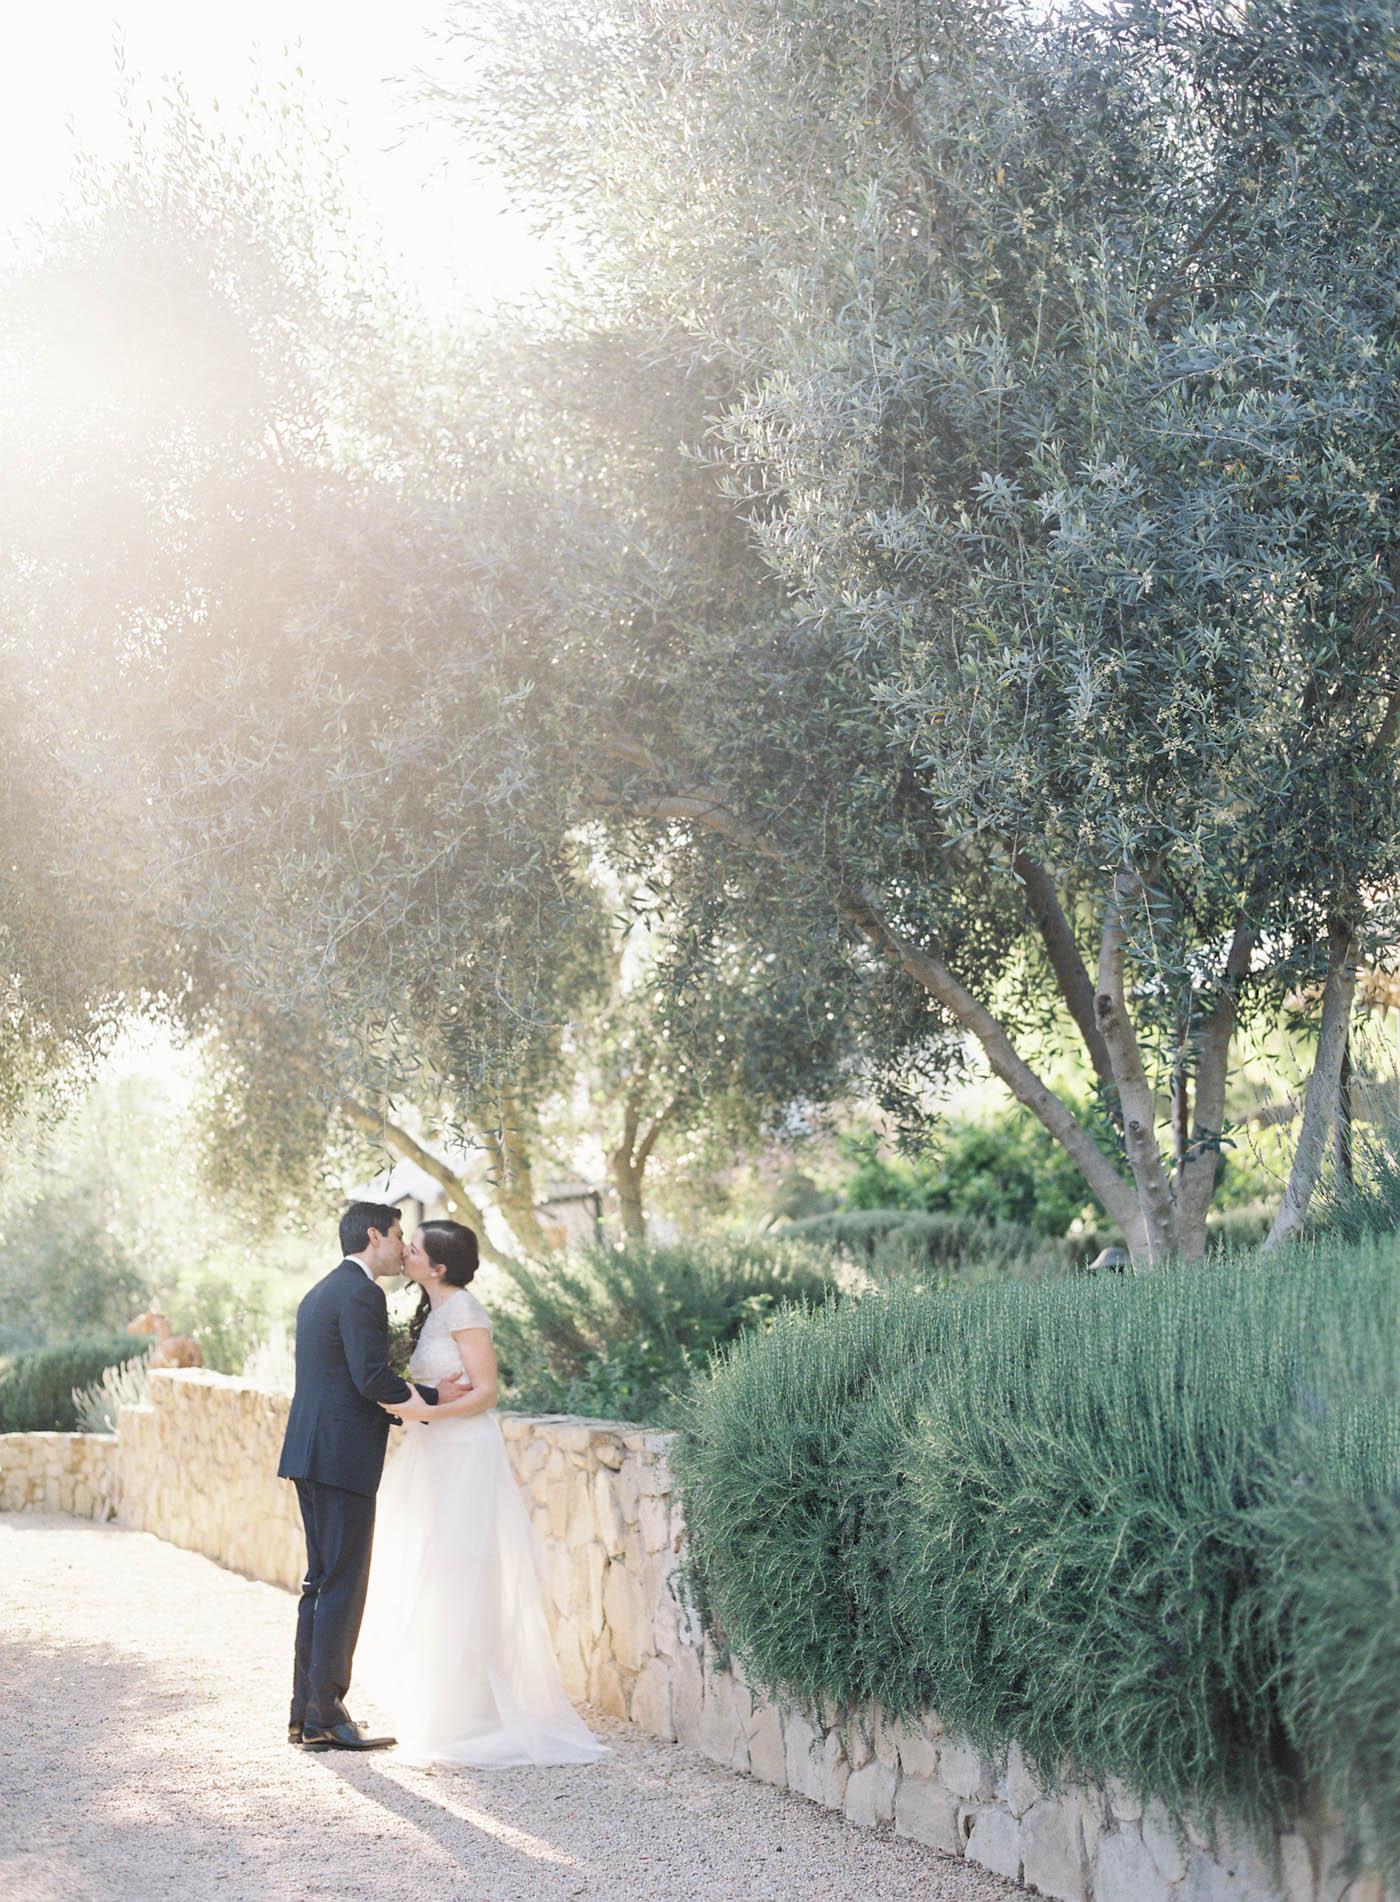 ojai-valley-inn-summer-wedding-jen-huang-18.jpg